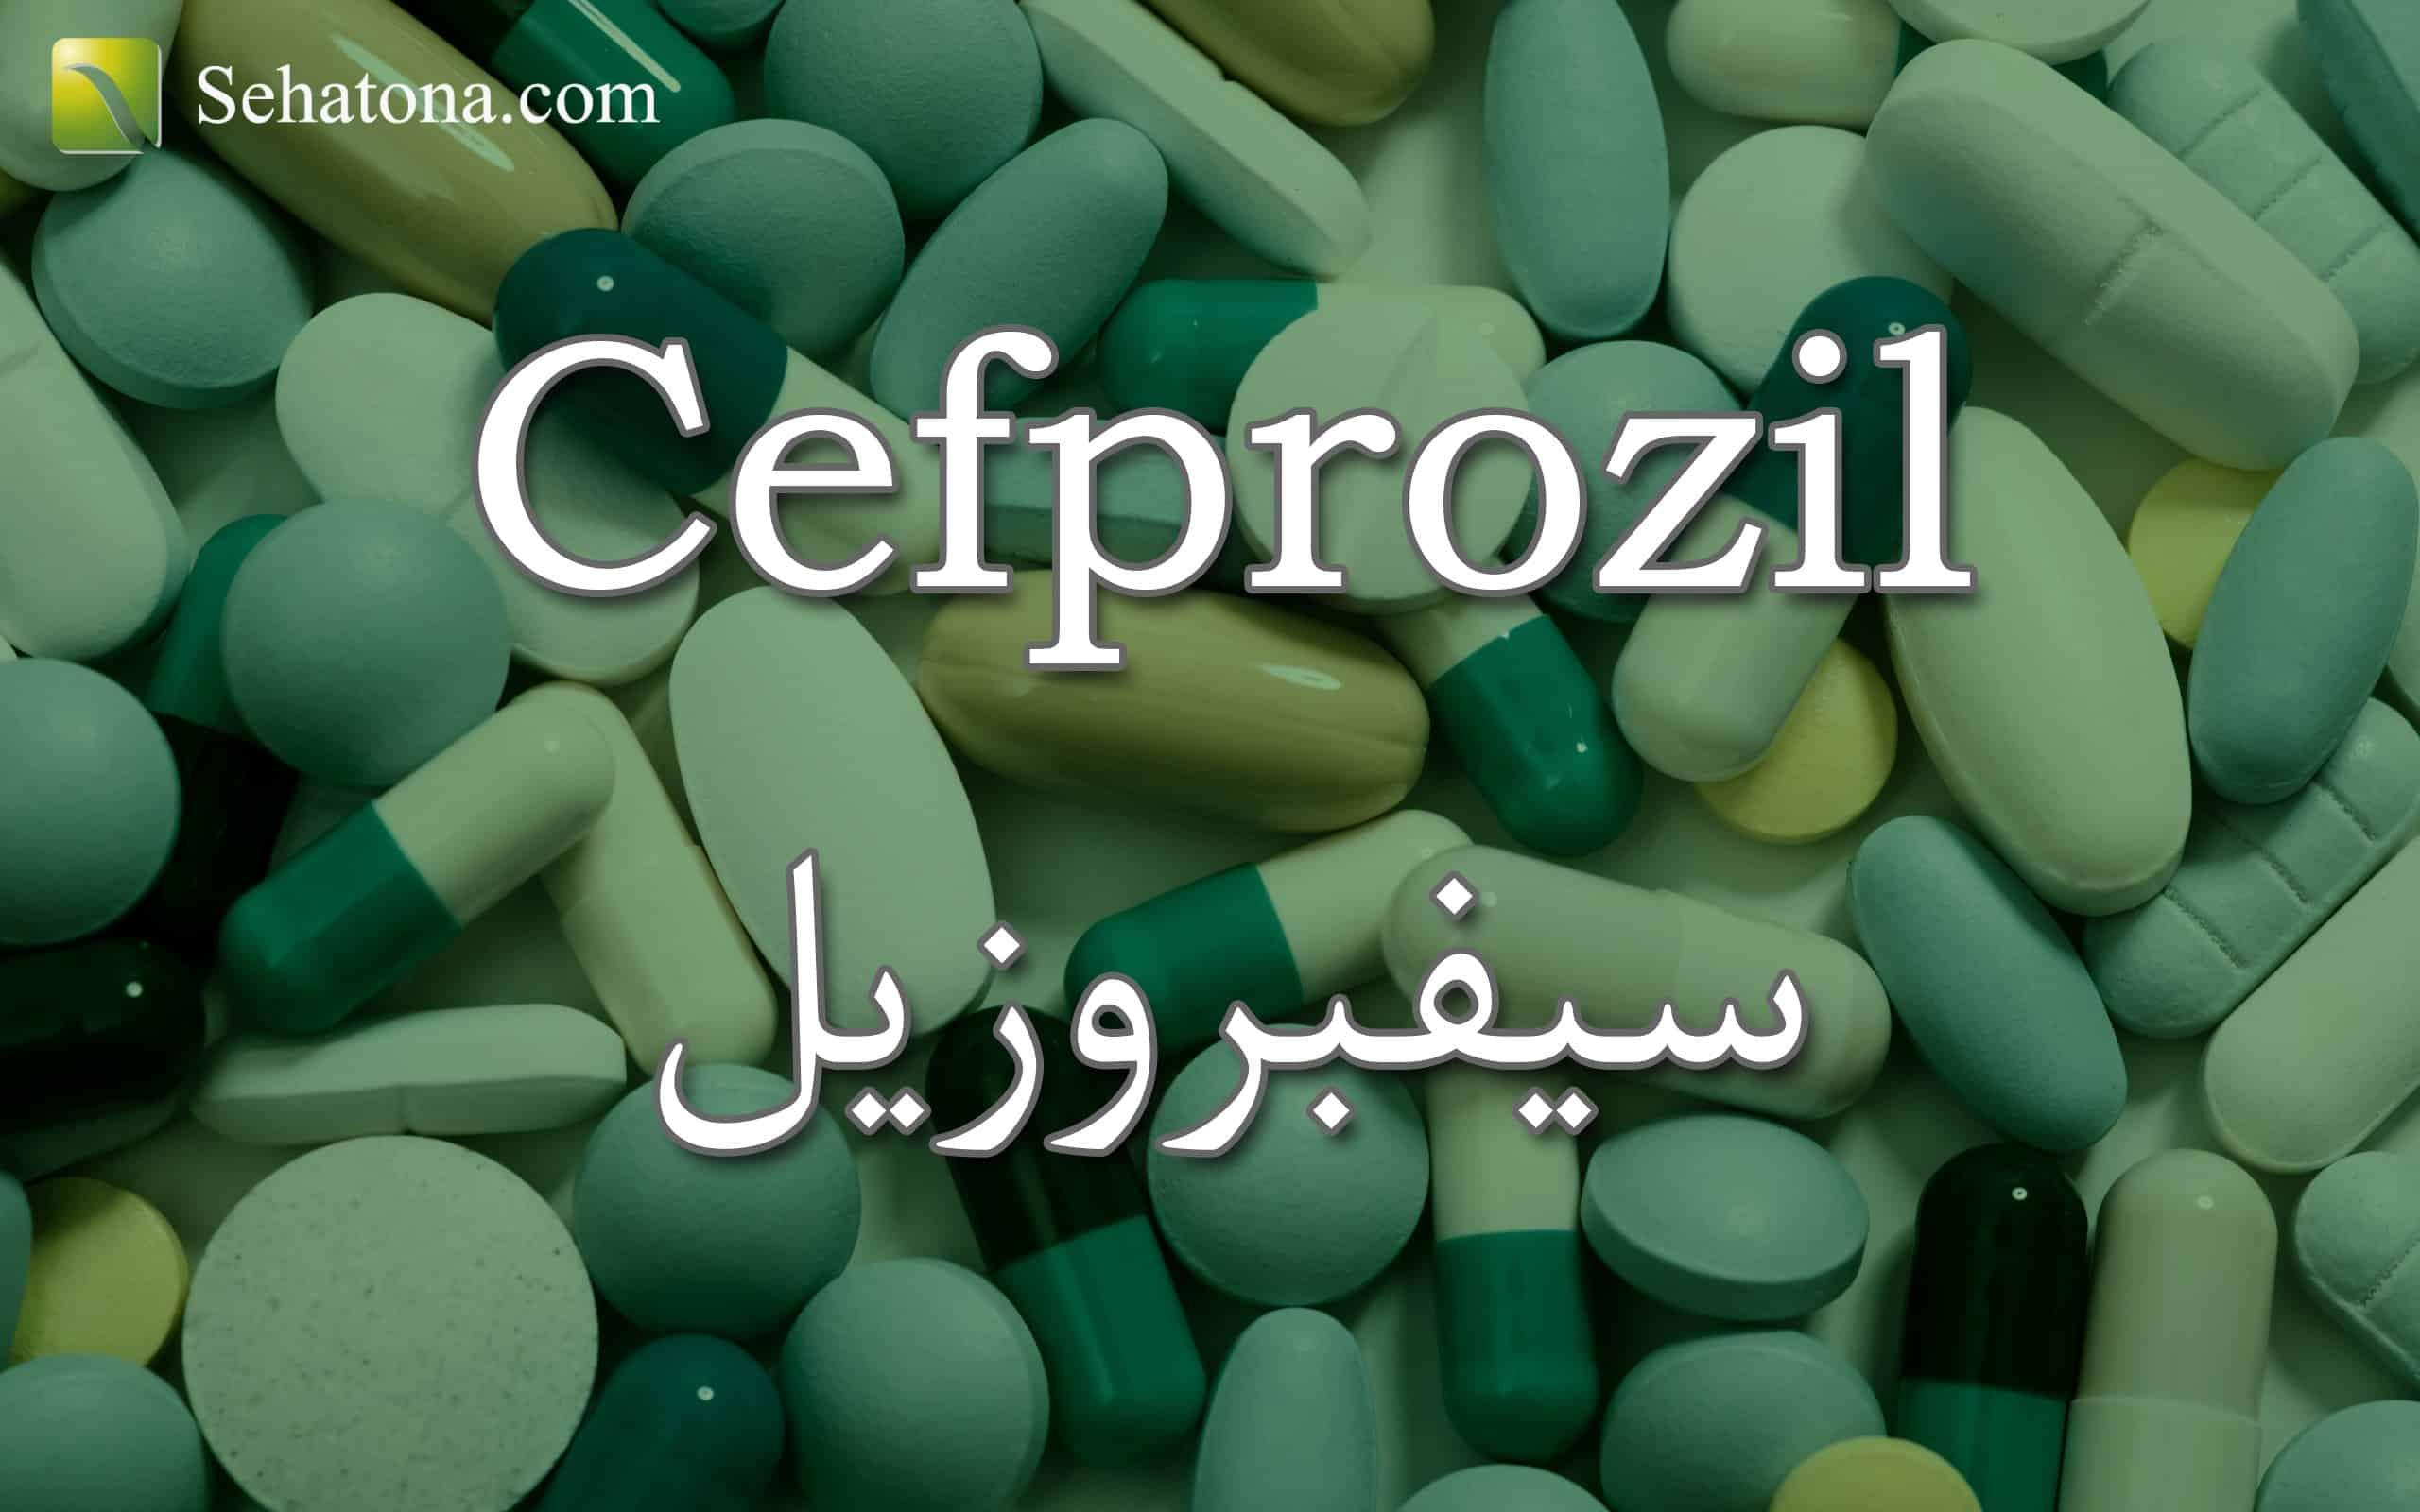 Cefprozil